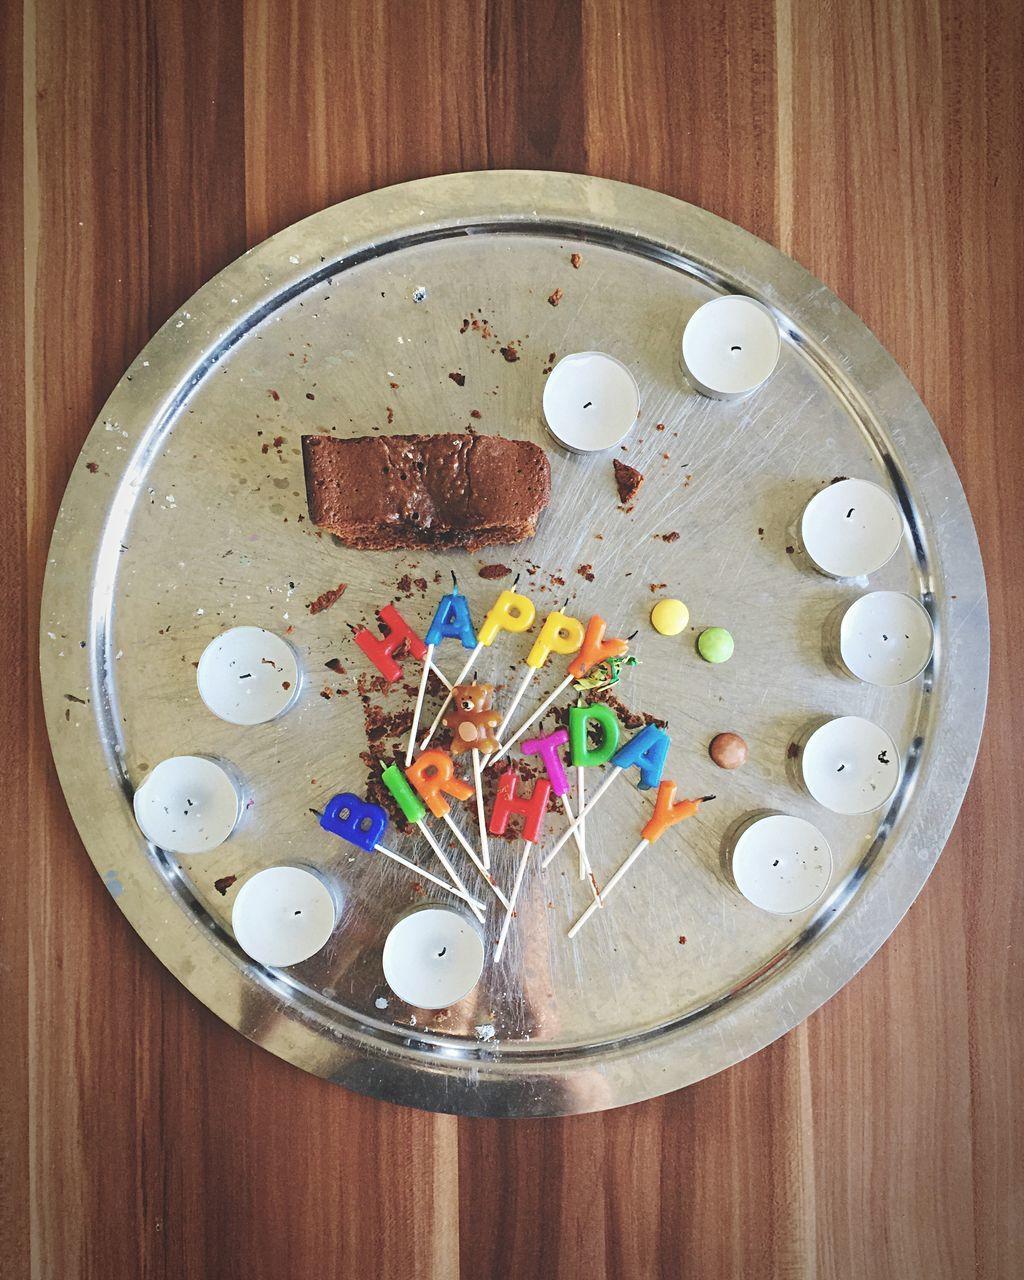 Leftovers Of Birthday Cake On Tray